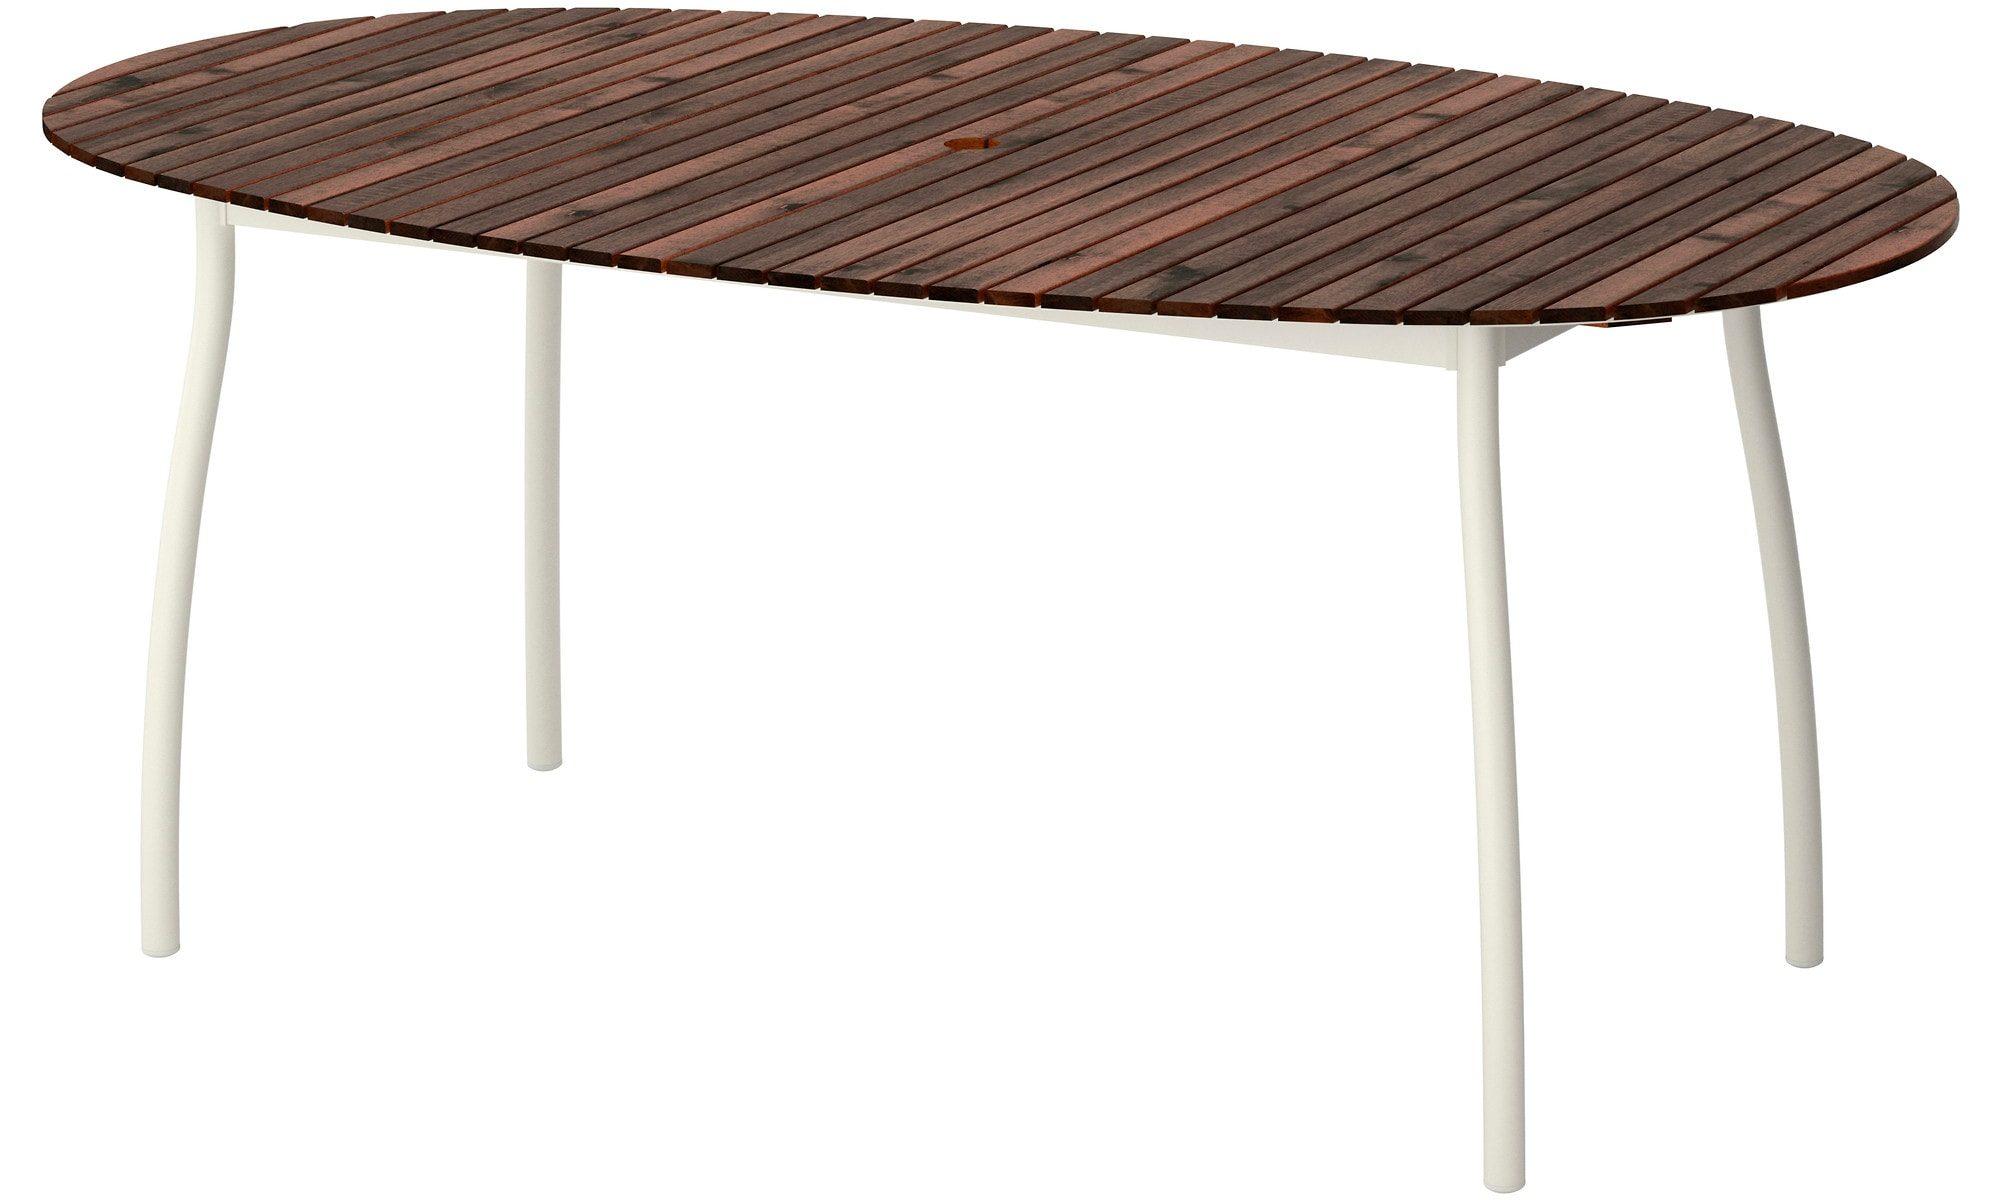 Vindals Table Outdoor Ikea inside outdoor table